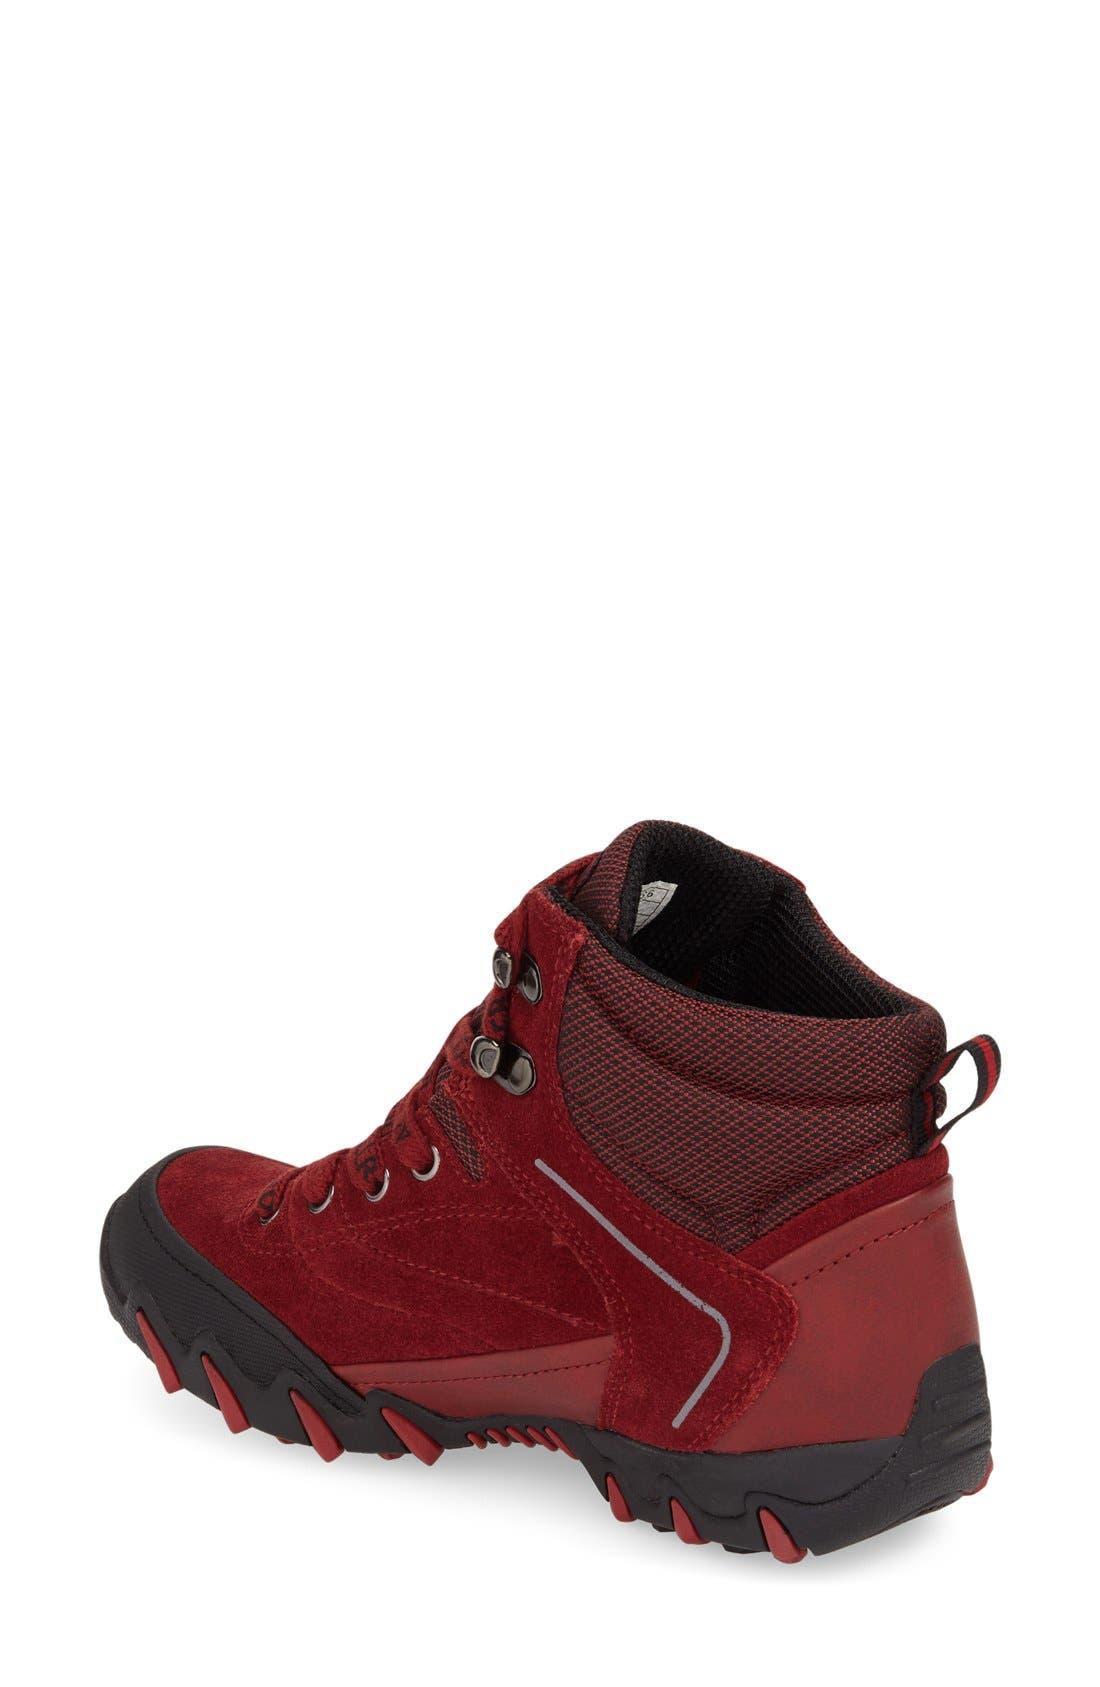 Alternate Image 2  - Allrounder by Mephisto 'Nigata-Tex' Waterproof Sneaker (Women)